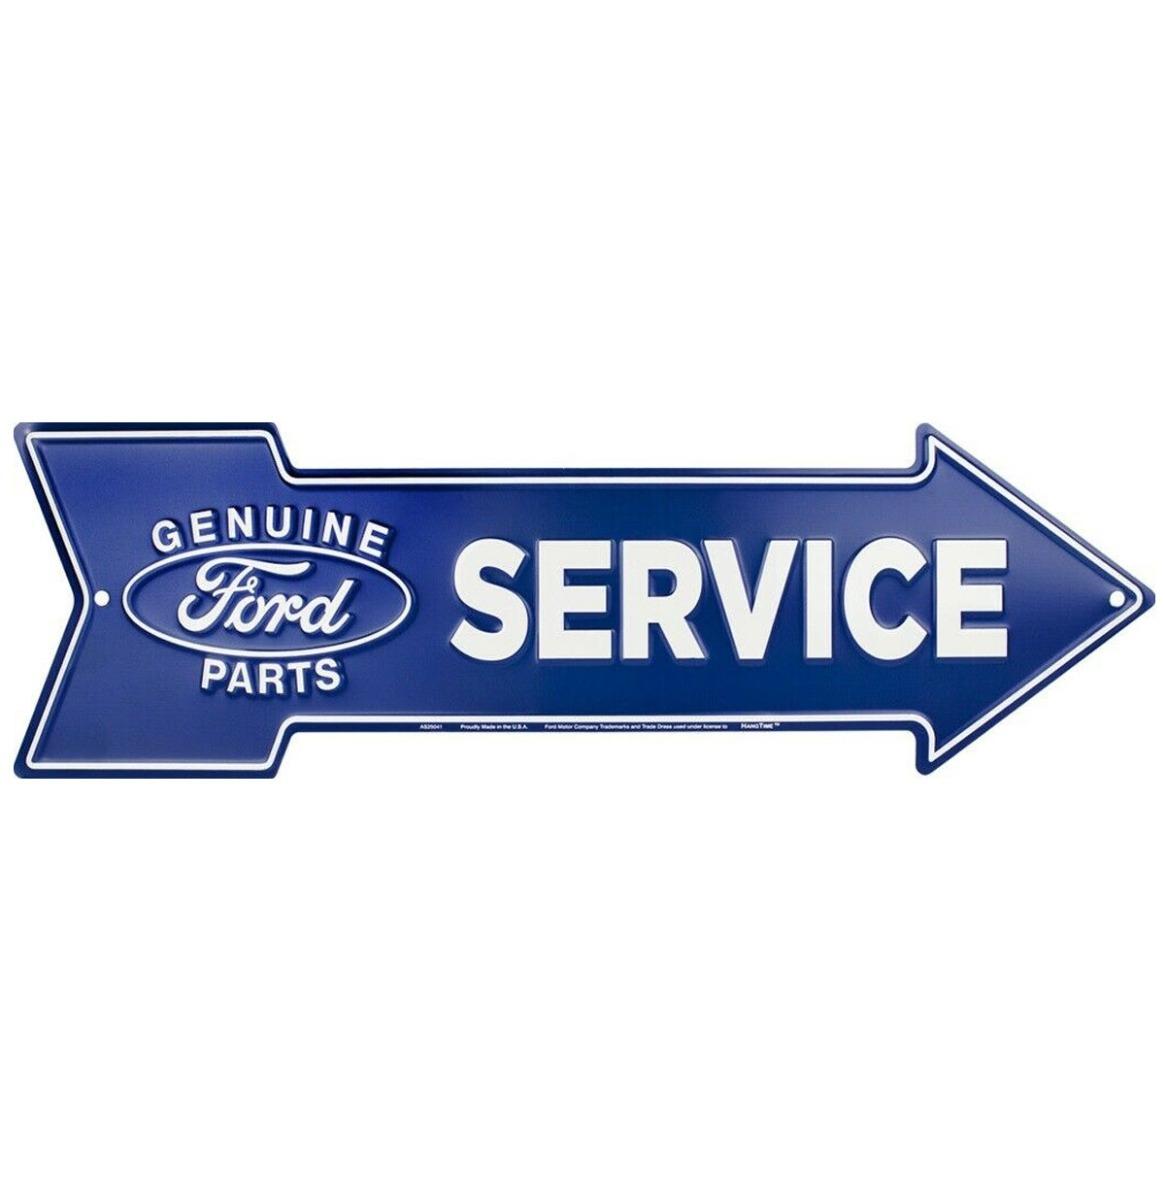 Ford Service Pijl Bord Aluminium - Blauw 50 x 14,5 cm